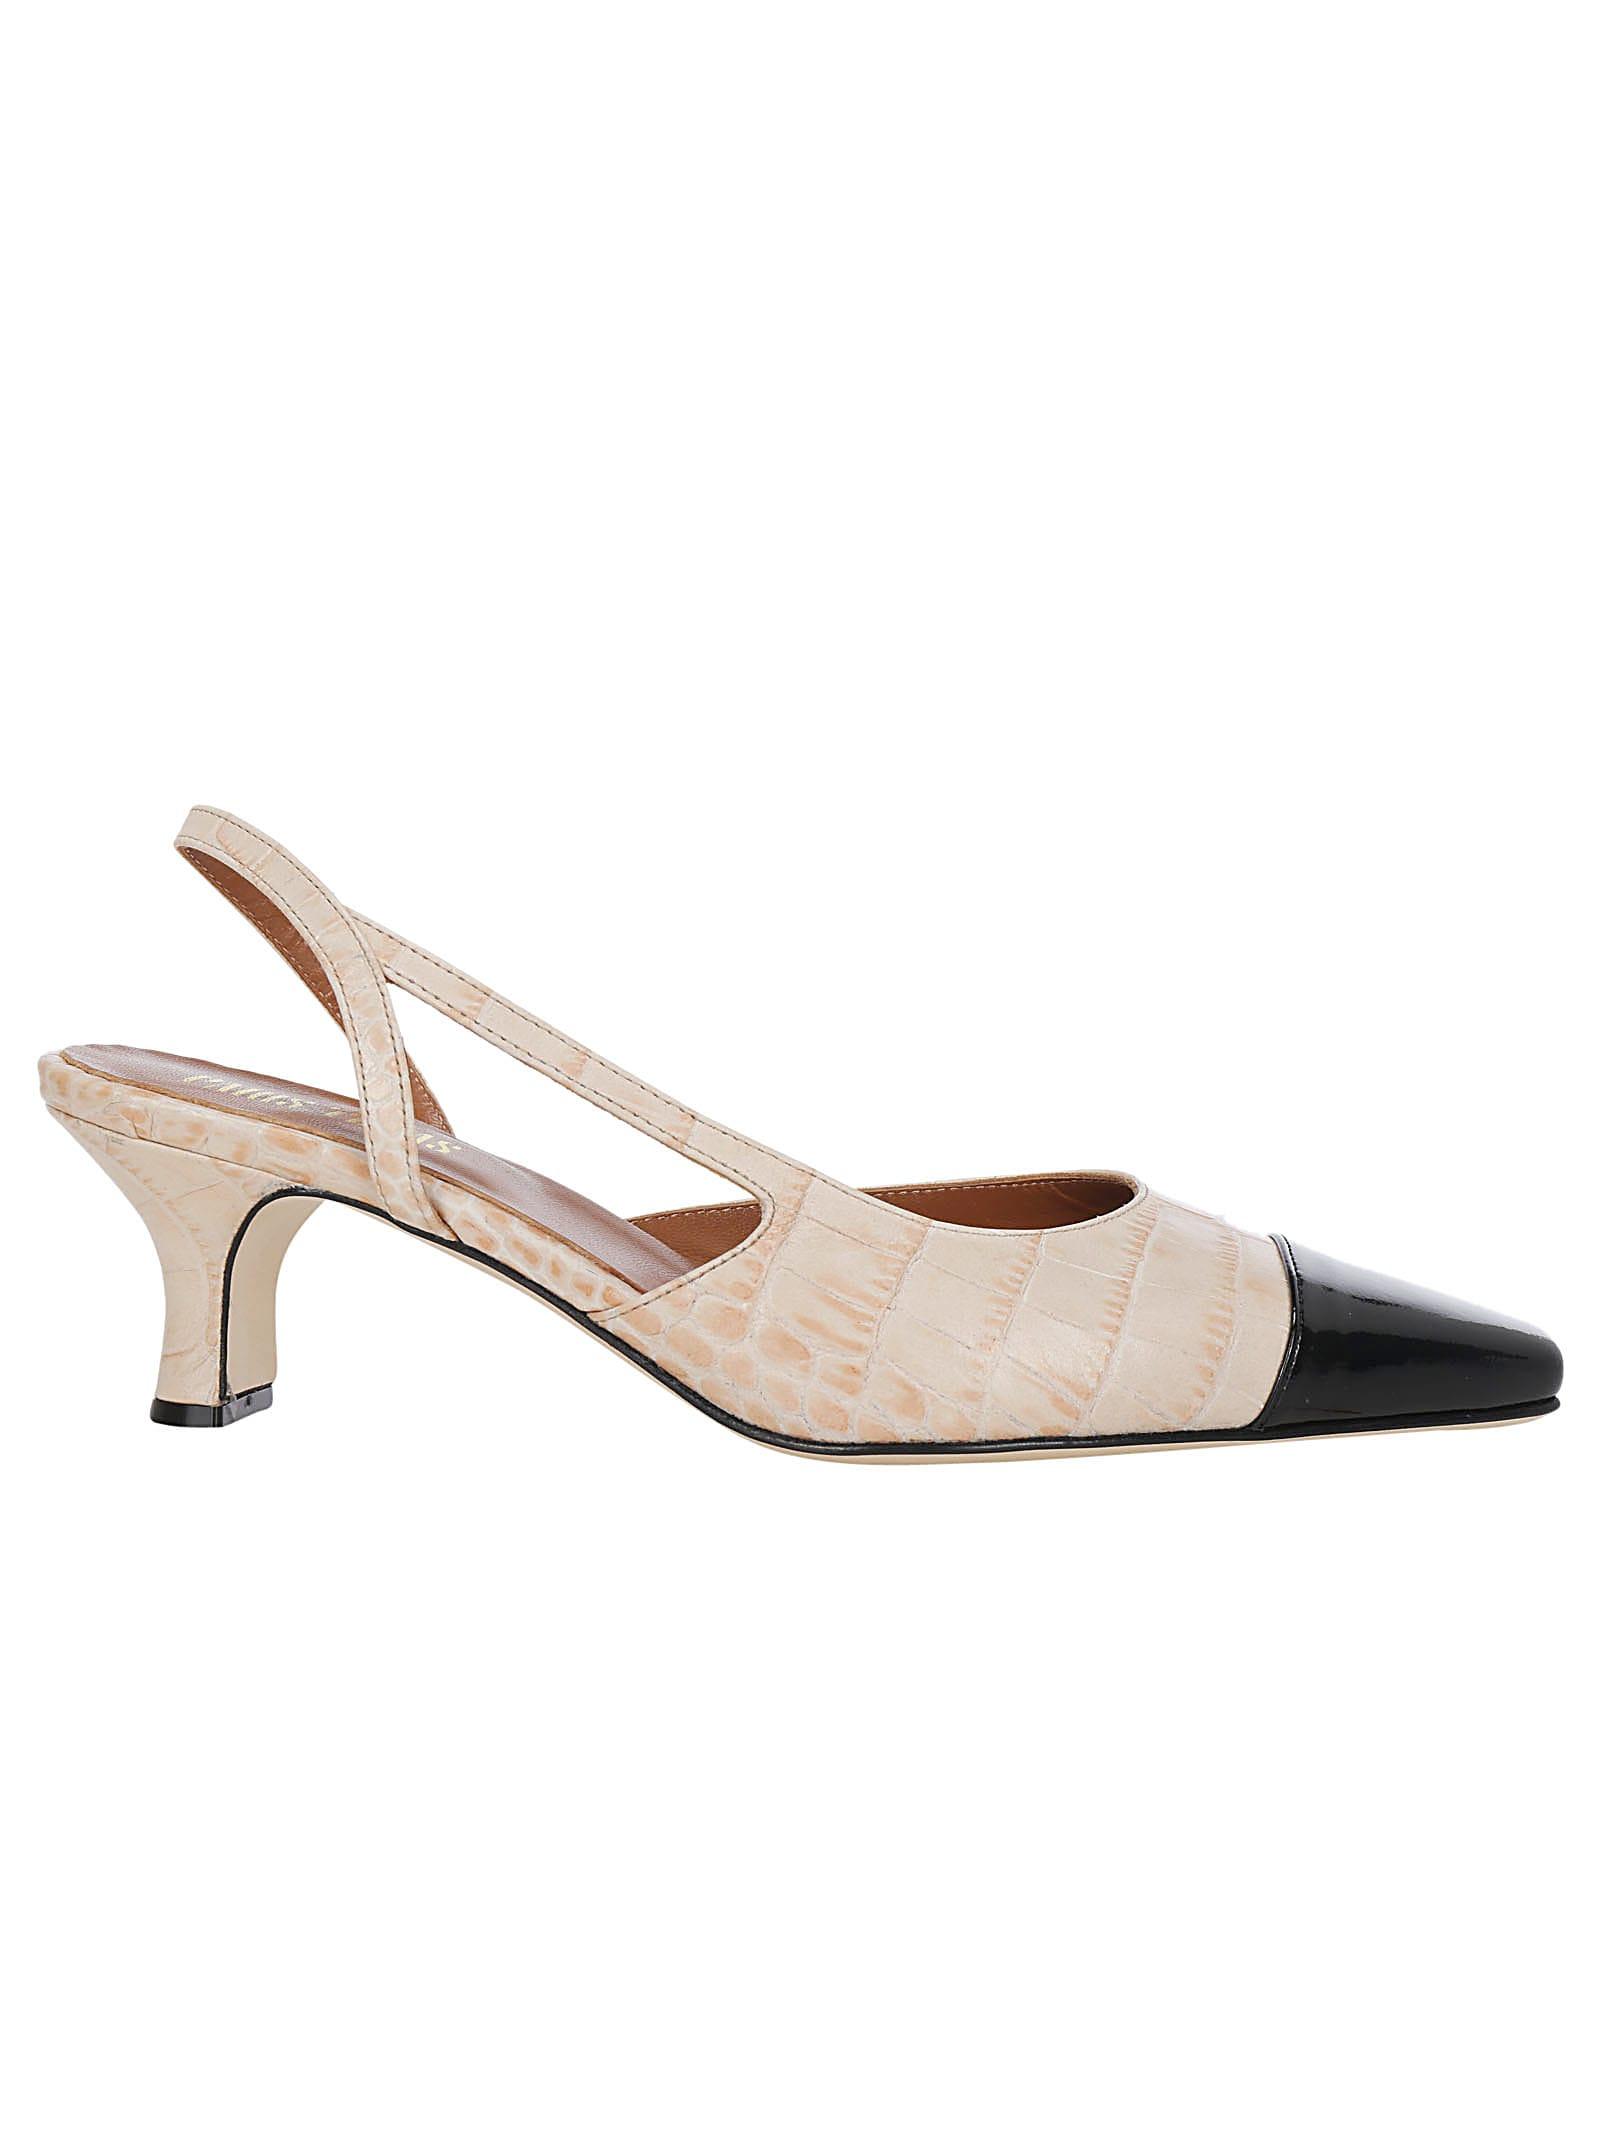 Paris Texas Slingback Sandals